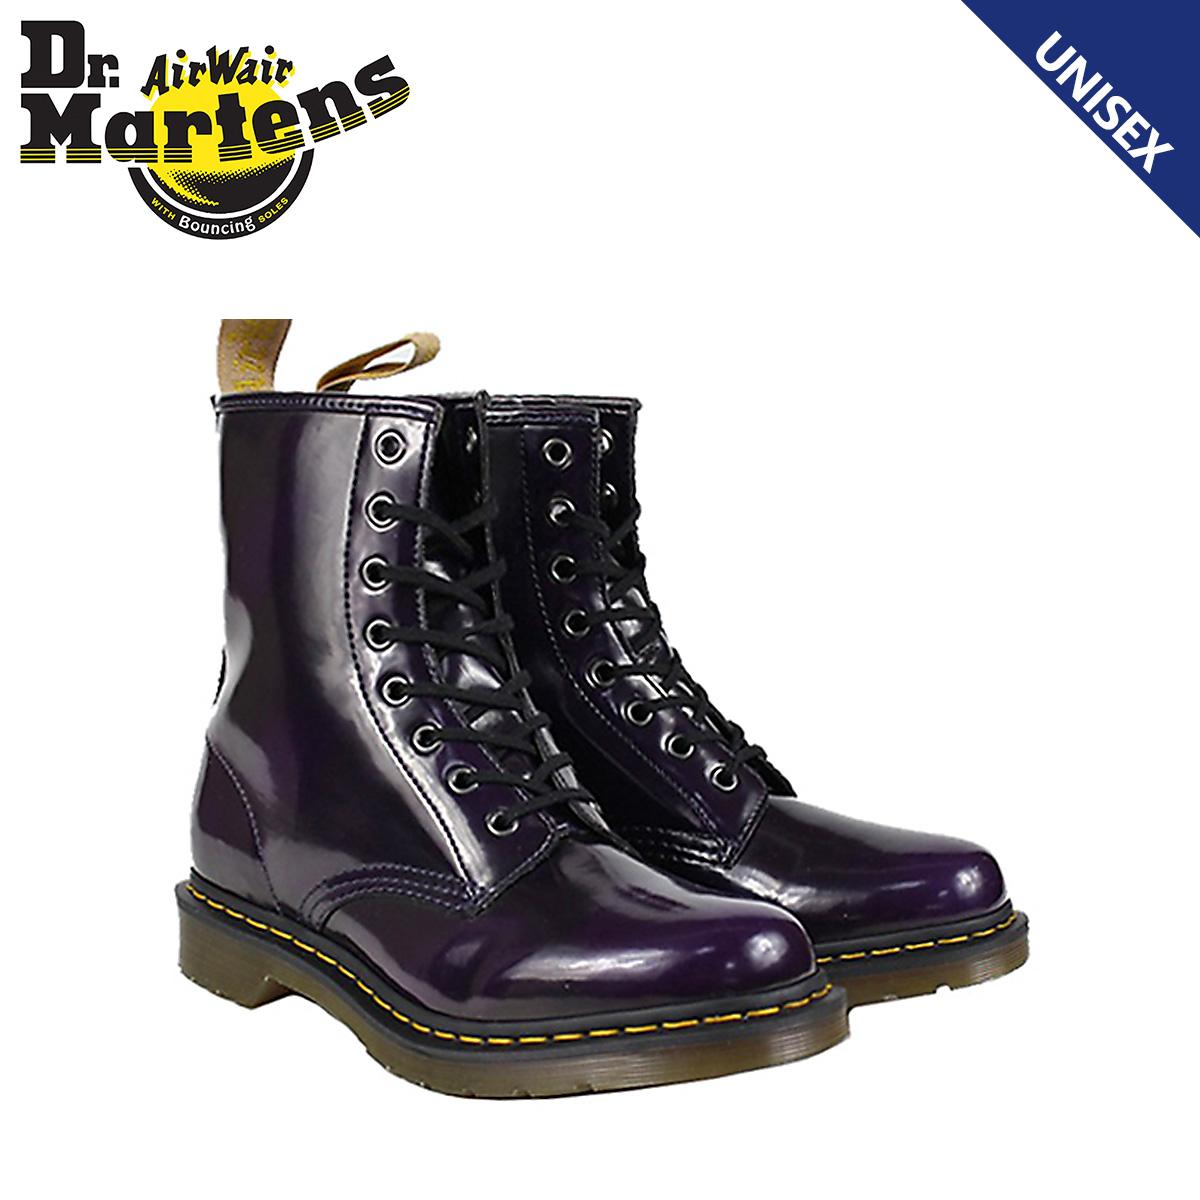 Dr.Martens ドクターマーチン 1460 8ホール ブーツ 8EYE BOOT R14585510 メンズ レディース